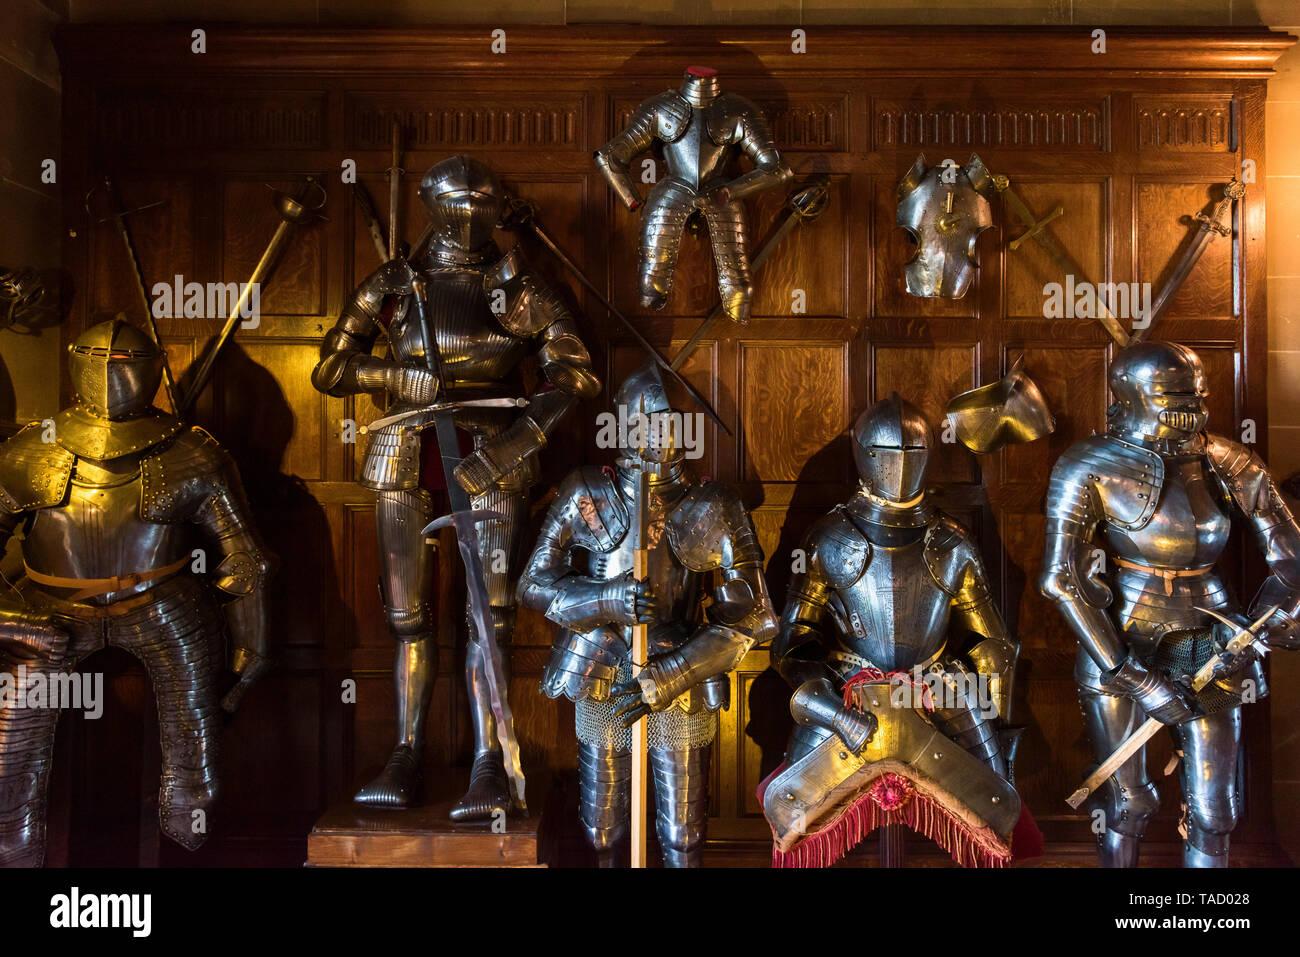 Armour display, Warwick Castle, Warwick, UK Stock Photo